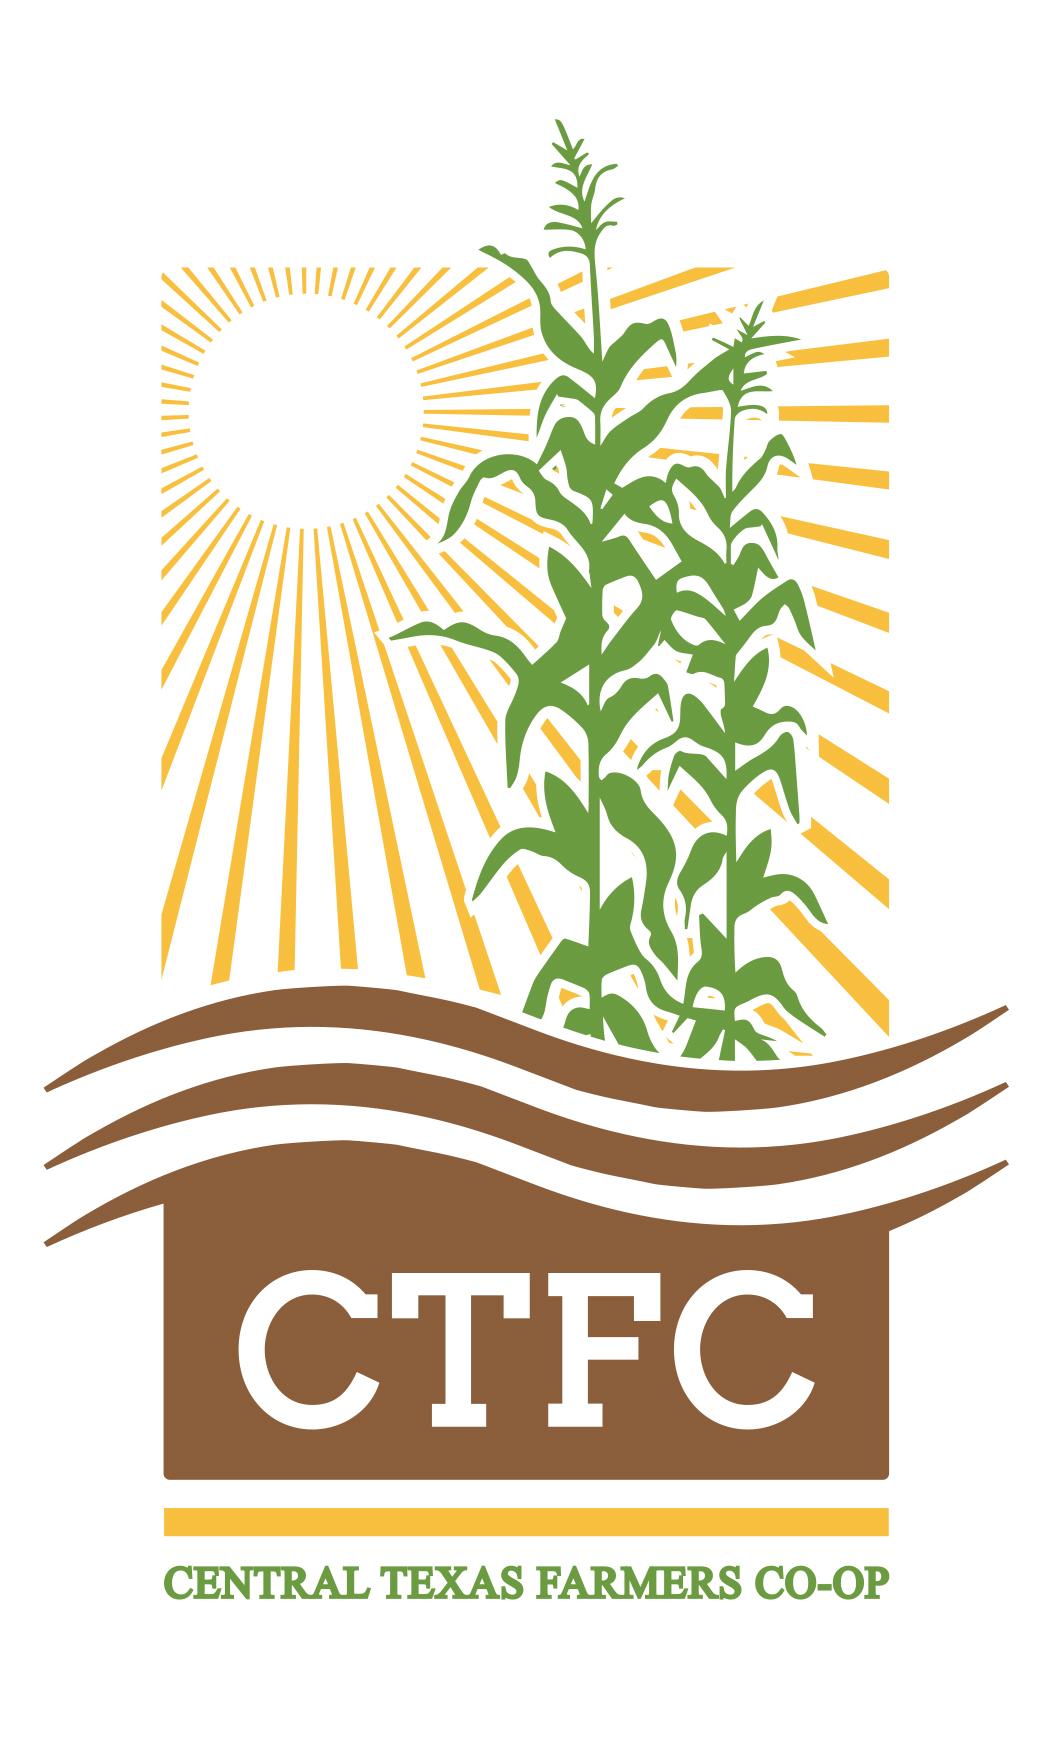 CENTRAL TEXAS FARMERS CO-OP - color logo - large.jpg